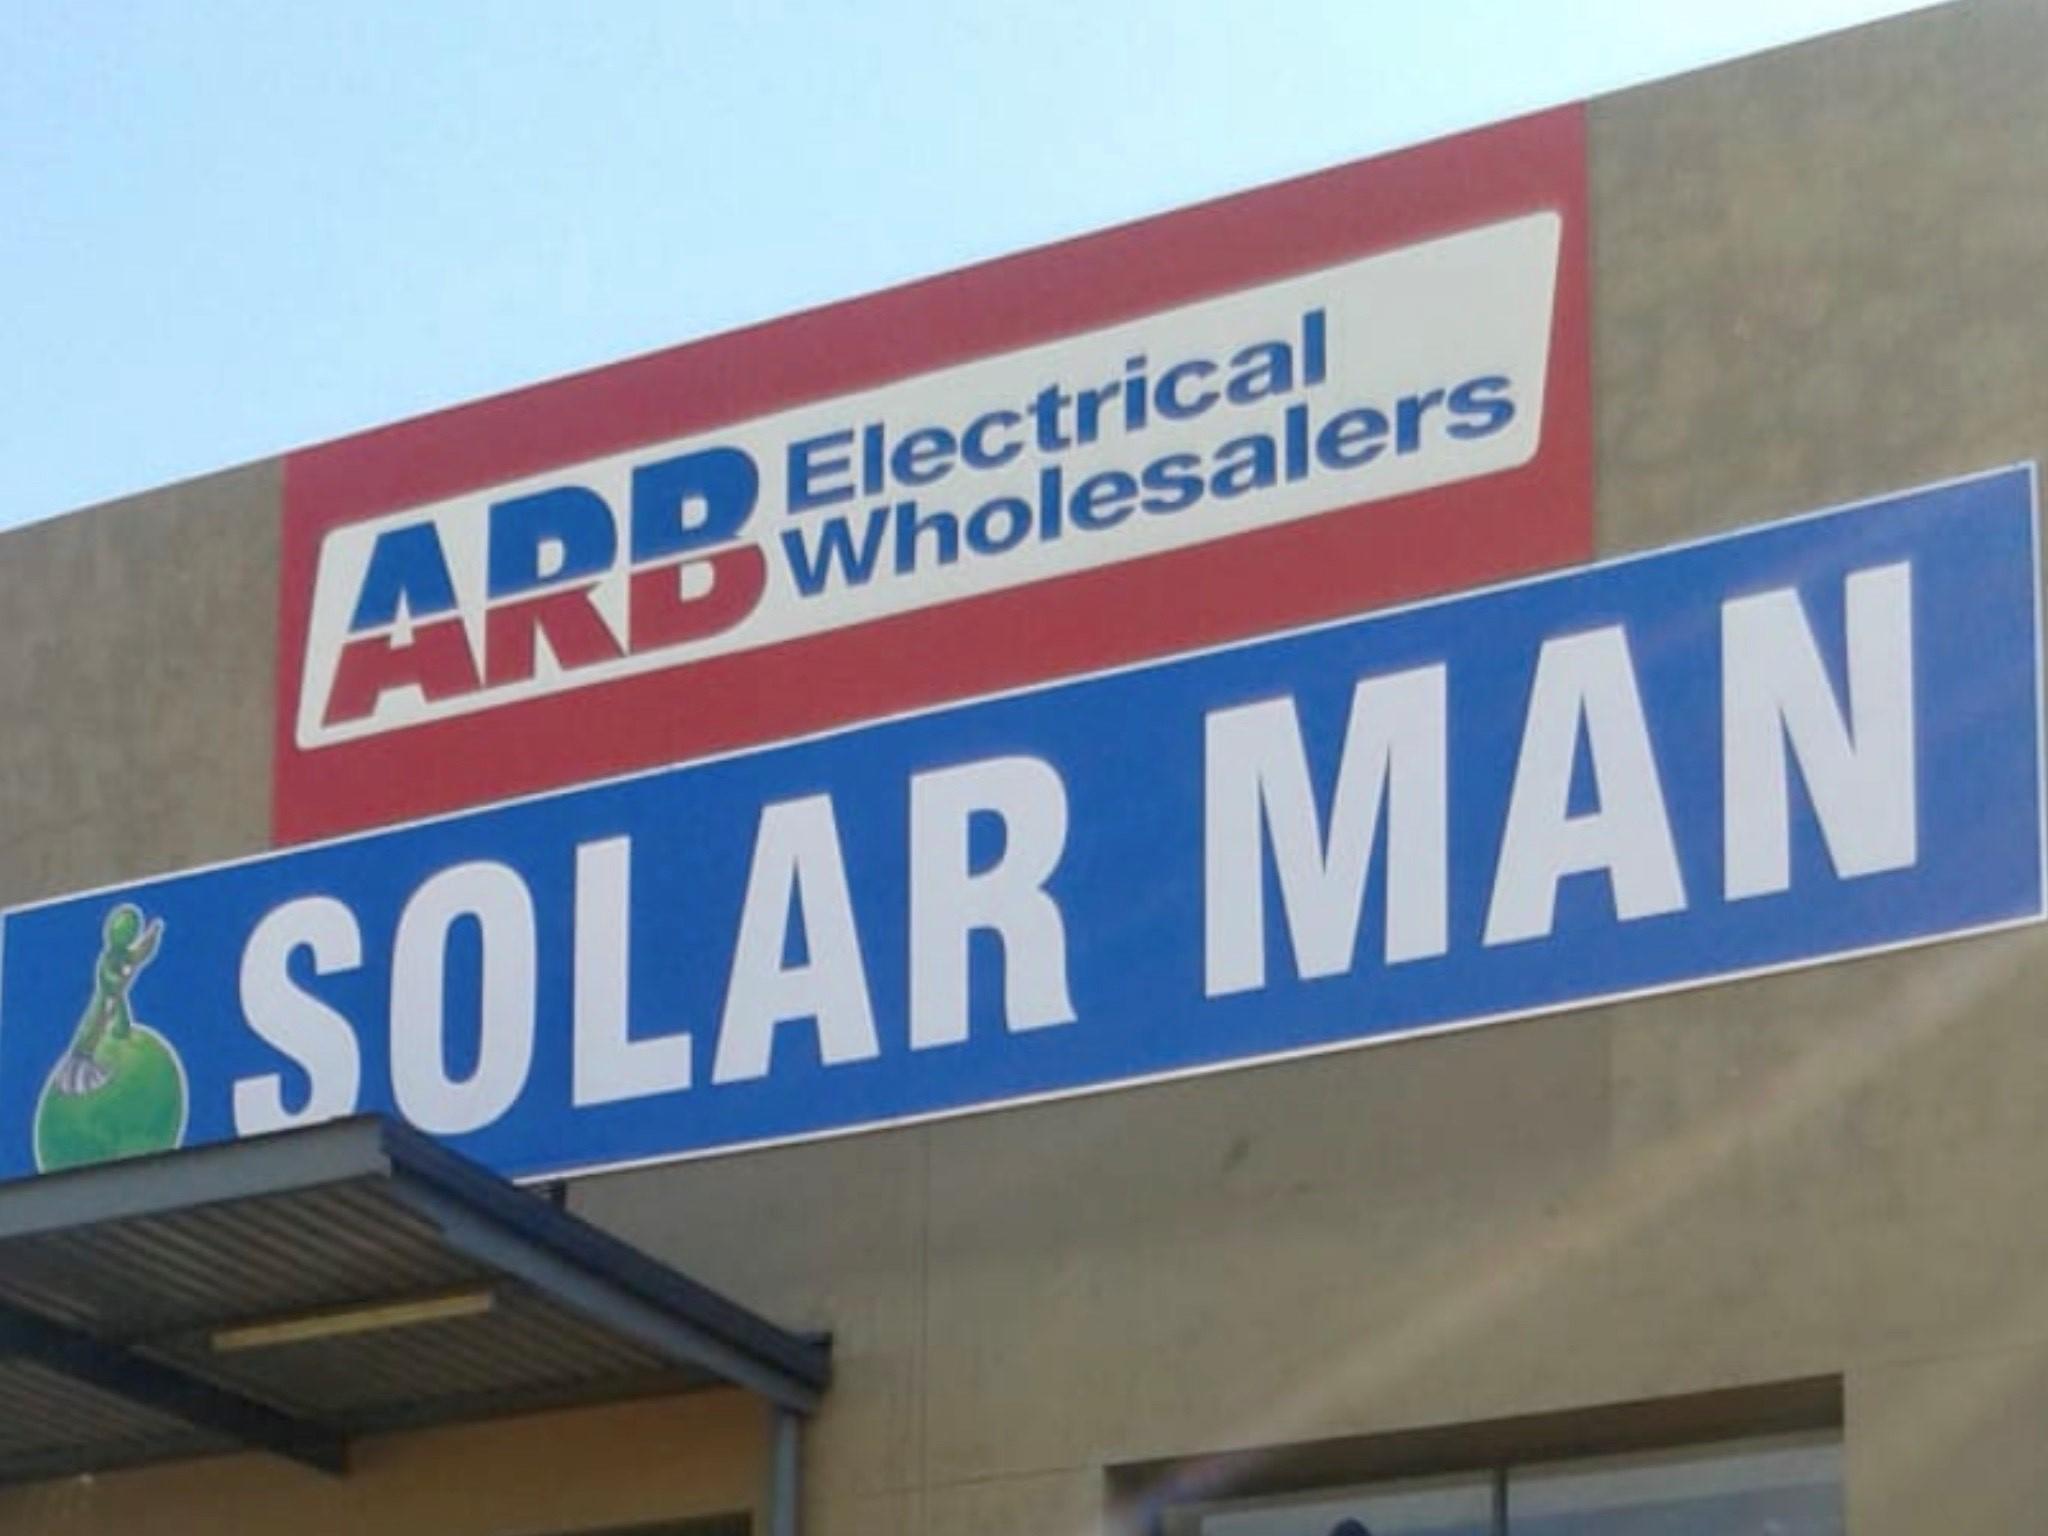 Solar Man SA - Storefront Exterior.